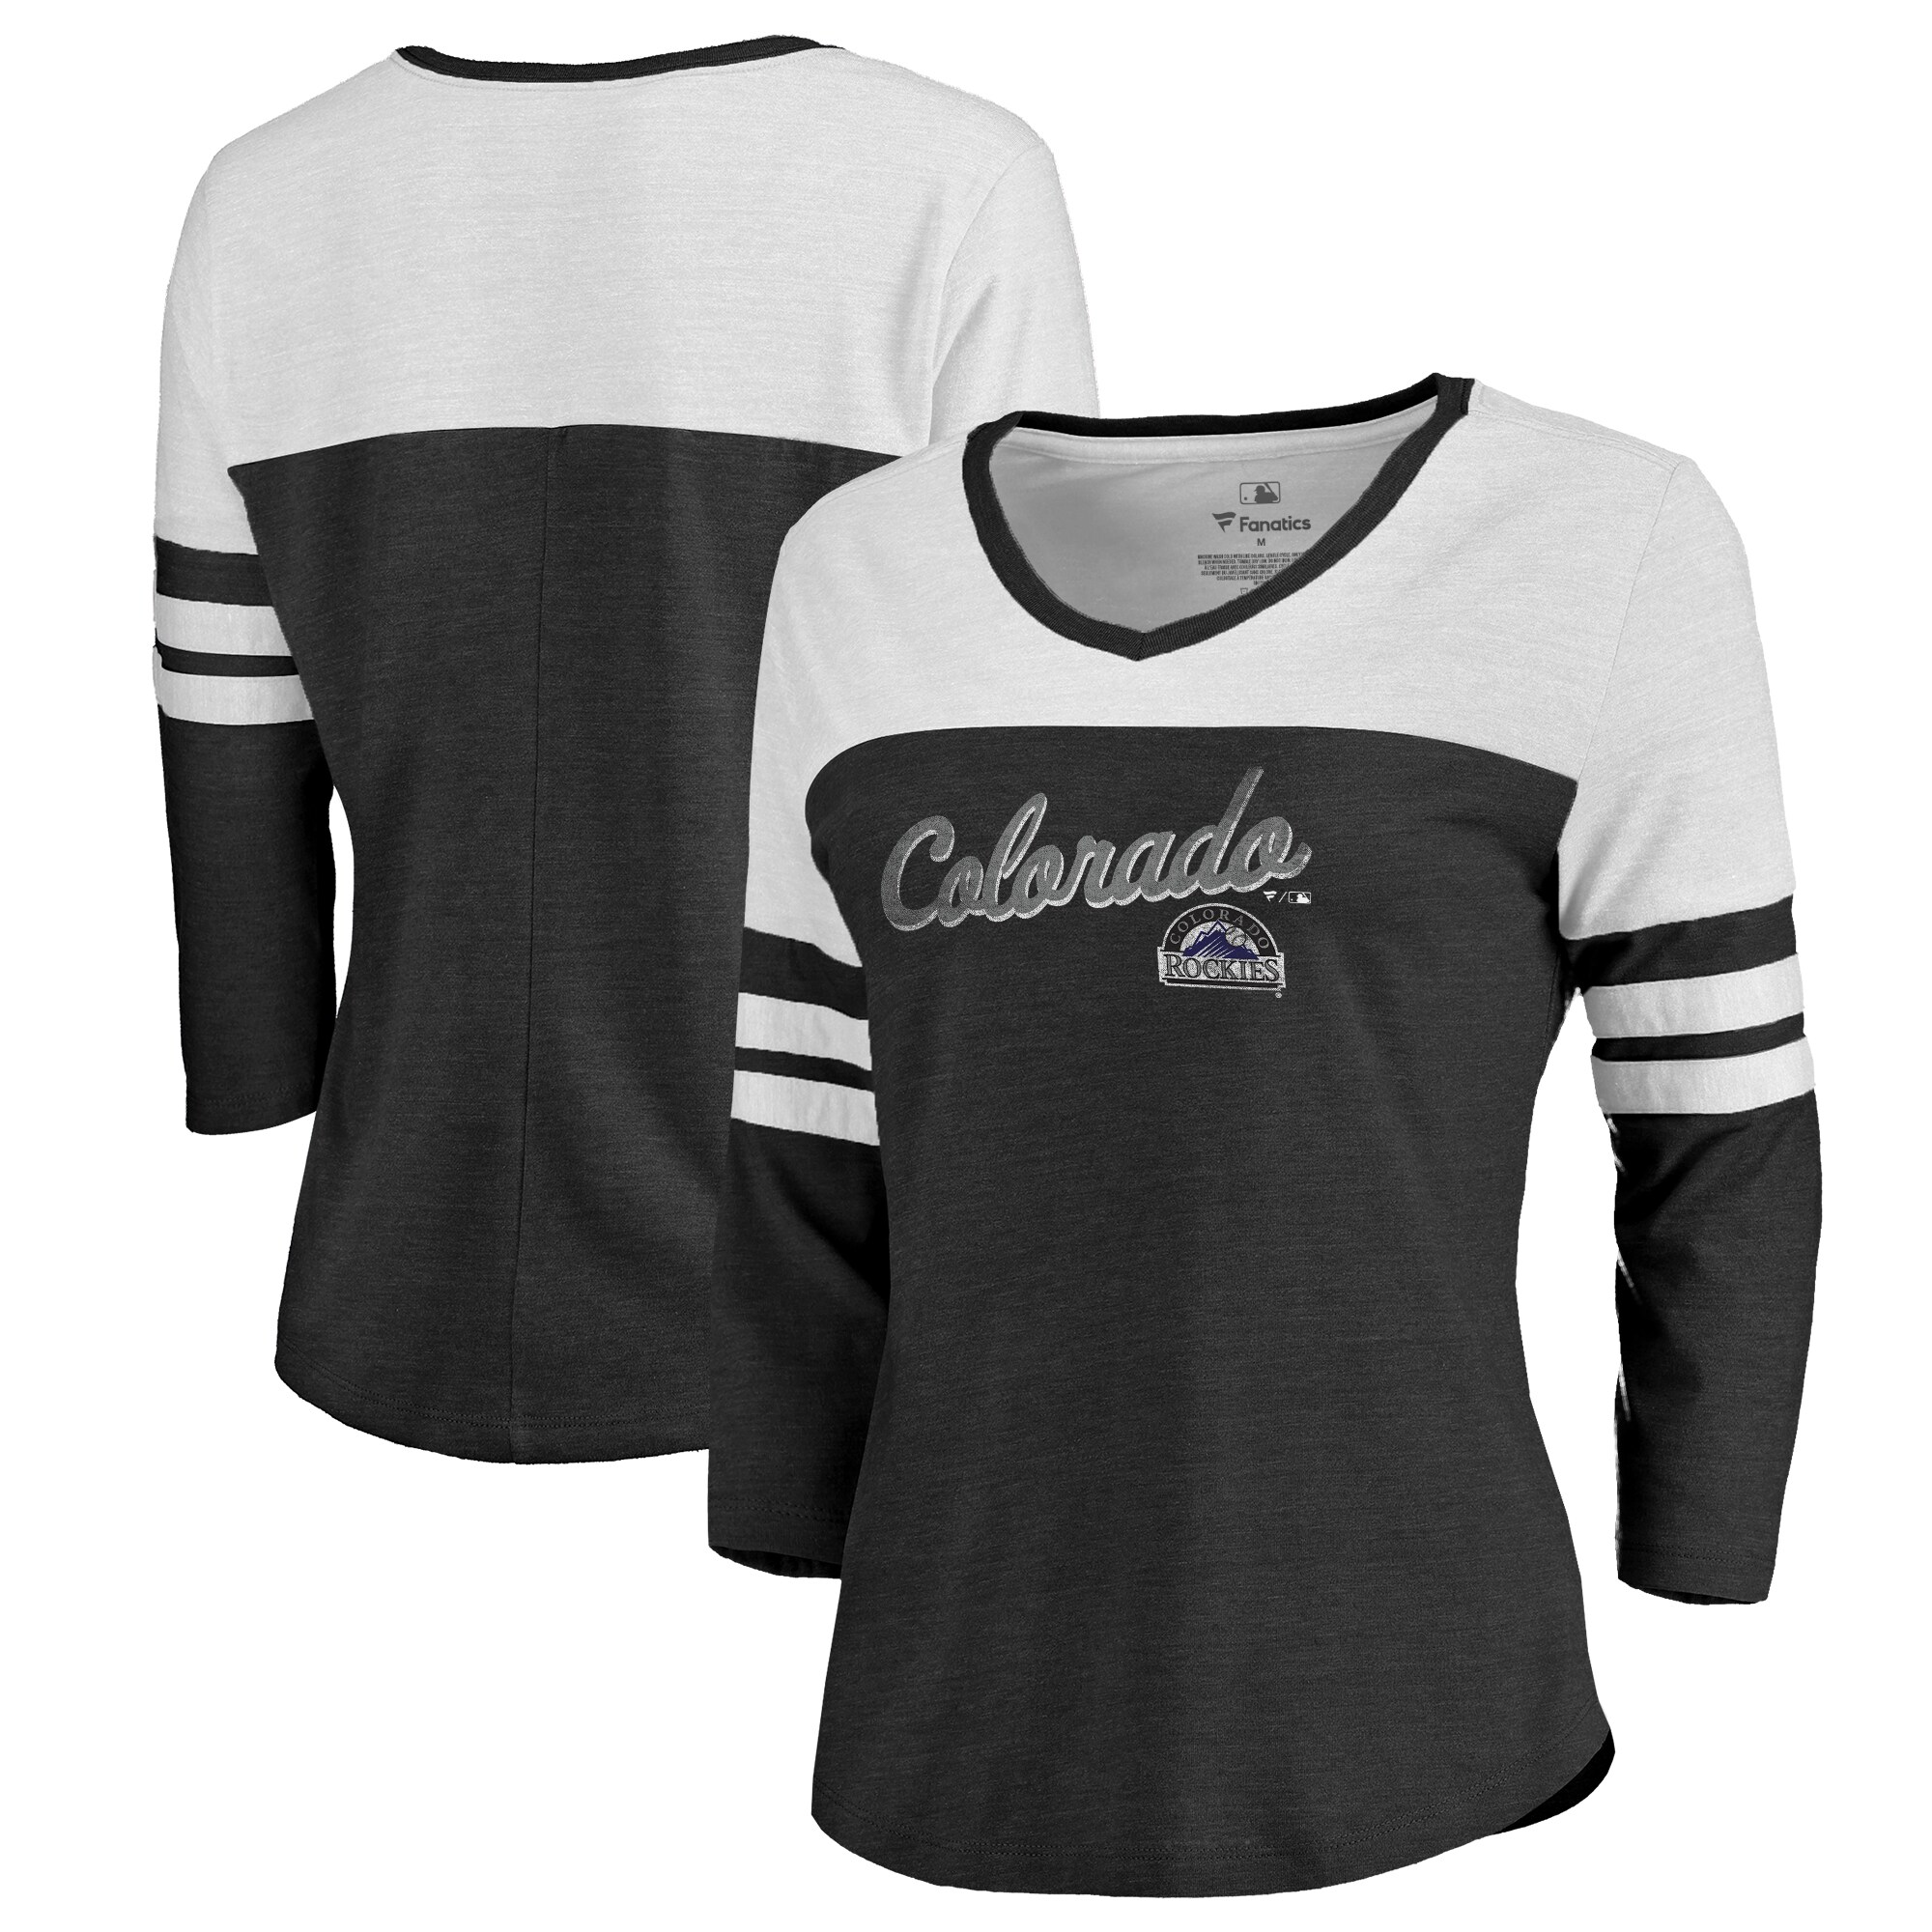 Fanatics Branded Colorado Rockies Women's Black Rising Script Color Block 3/4 Sleeve Tri-Blend T-Shirt